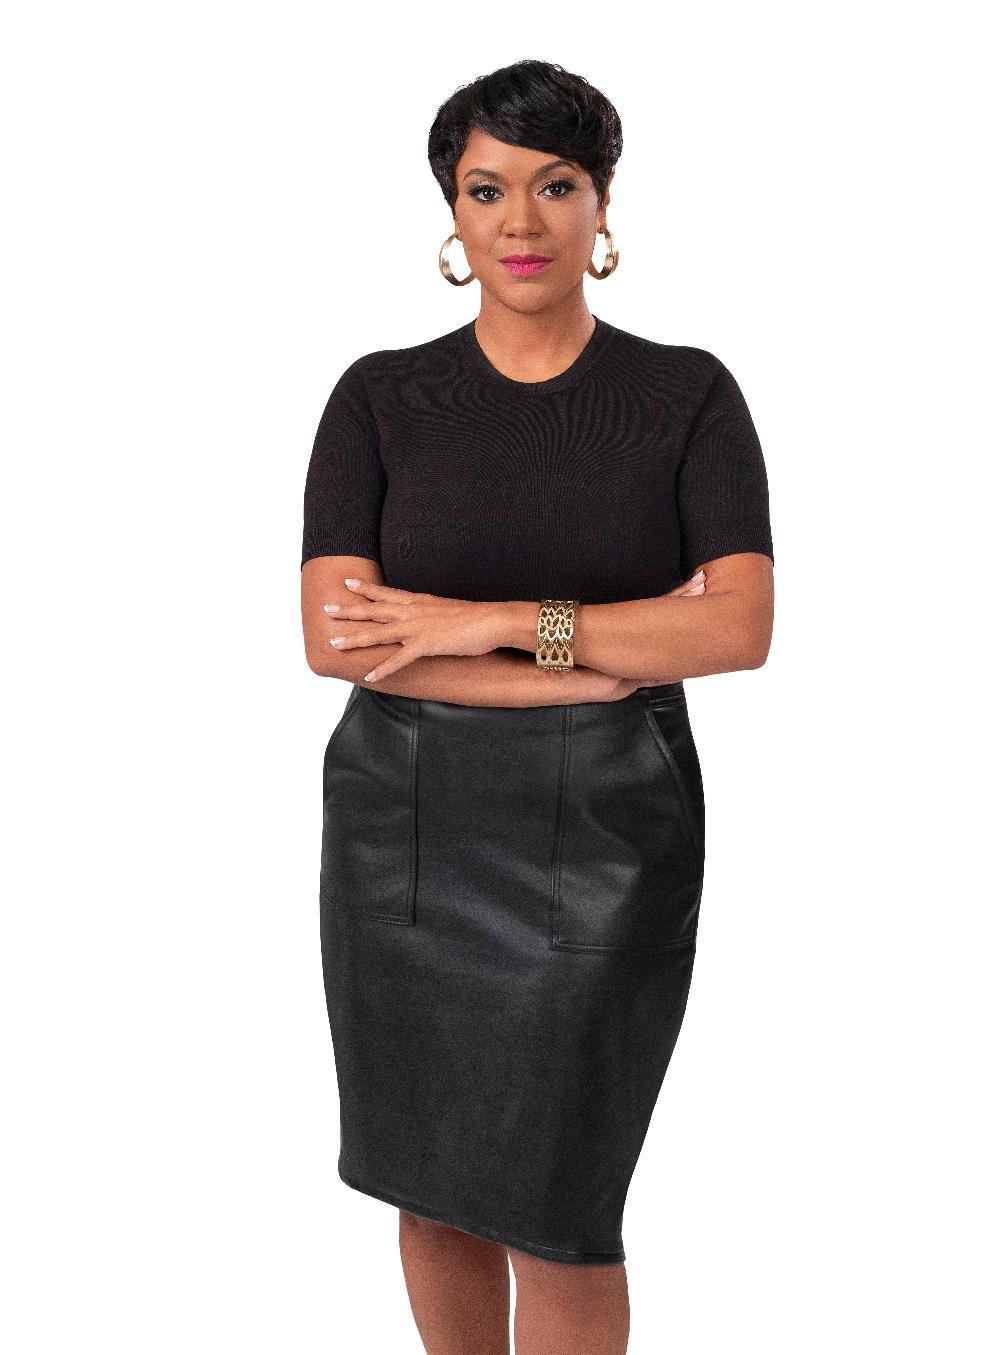 Tiffany Cross / MSNBC